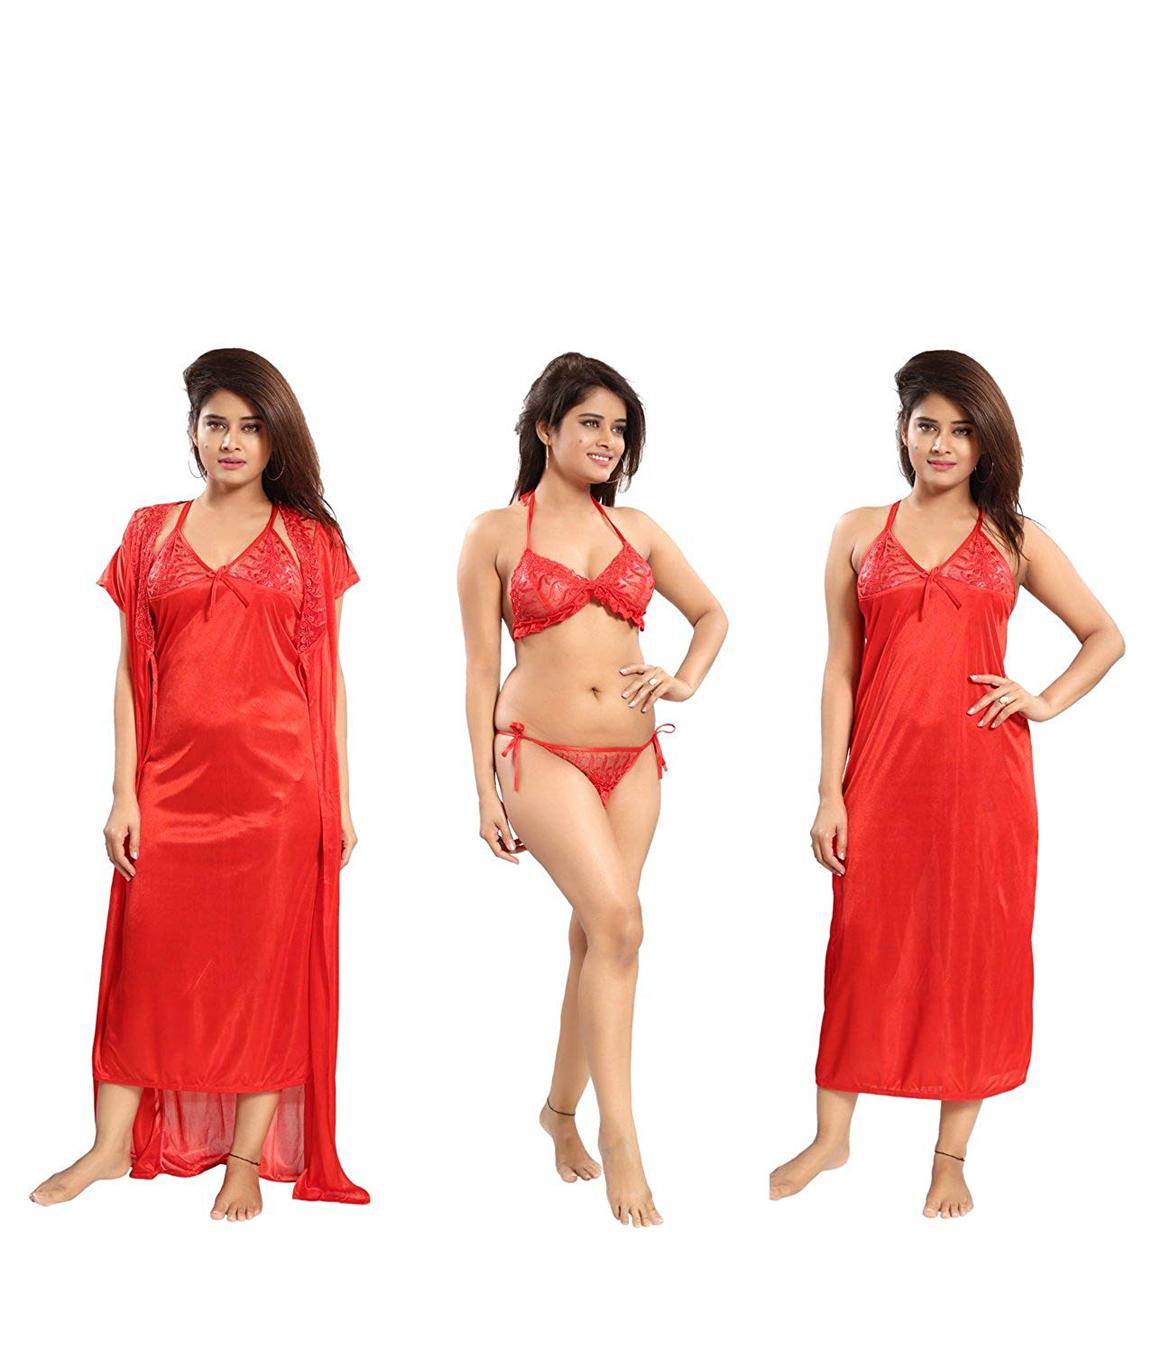 Romaisa Women`s Satin Nightwear Set of 4 Pcs Nighty, Wrap Gown, Bra & Thong (Size - Small, Medium, Large) (Pack of 4) COLOUR : RED